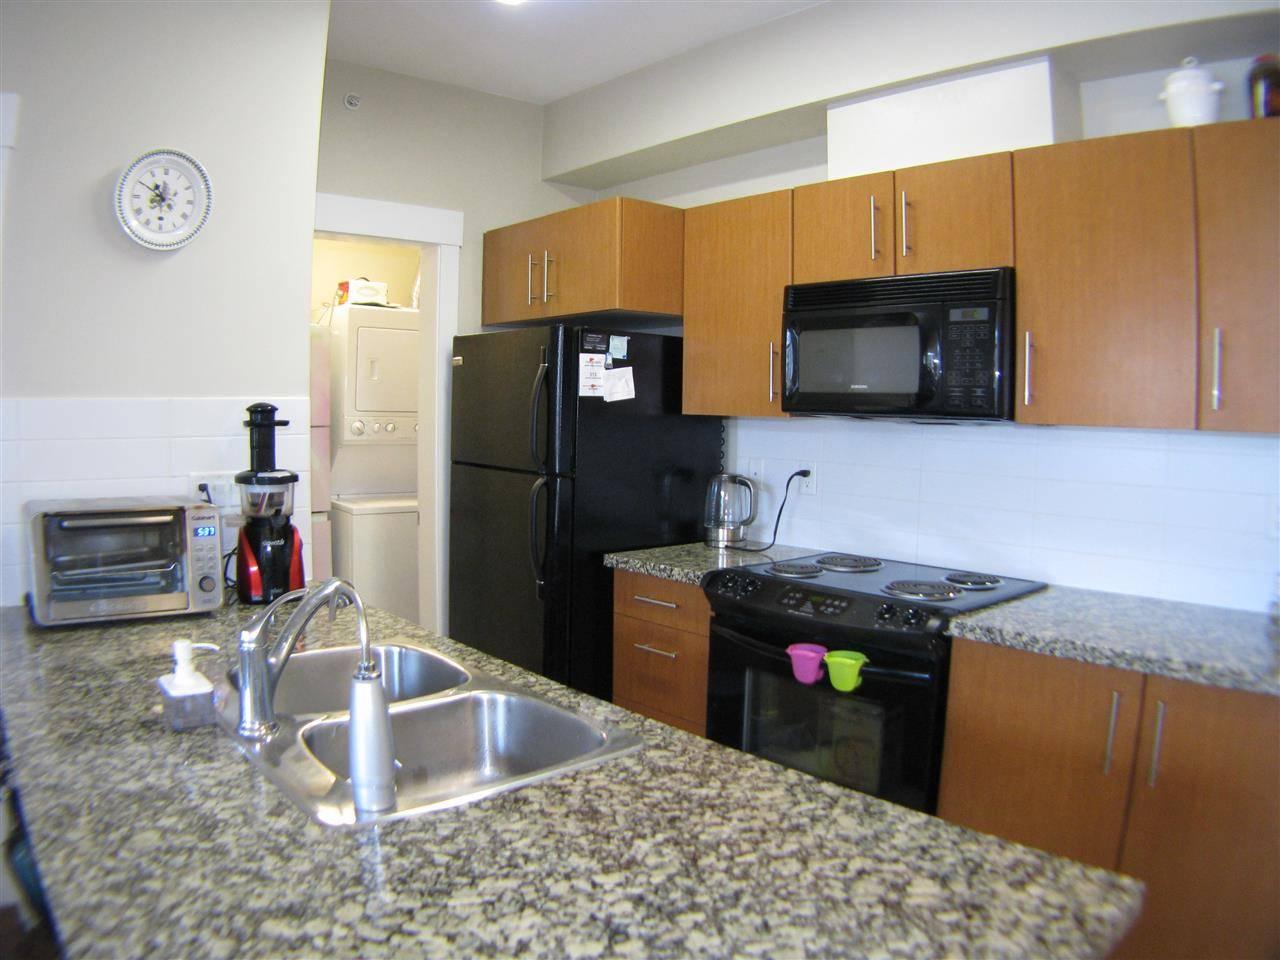 Buliding: 33546 Holland Avenue, Abbotsford, BC